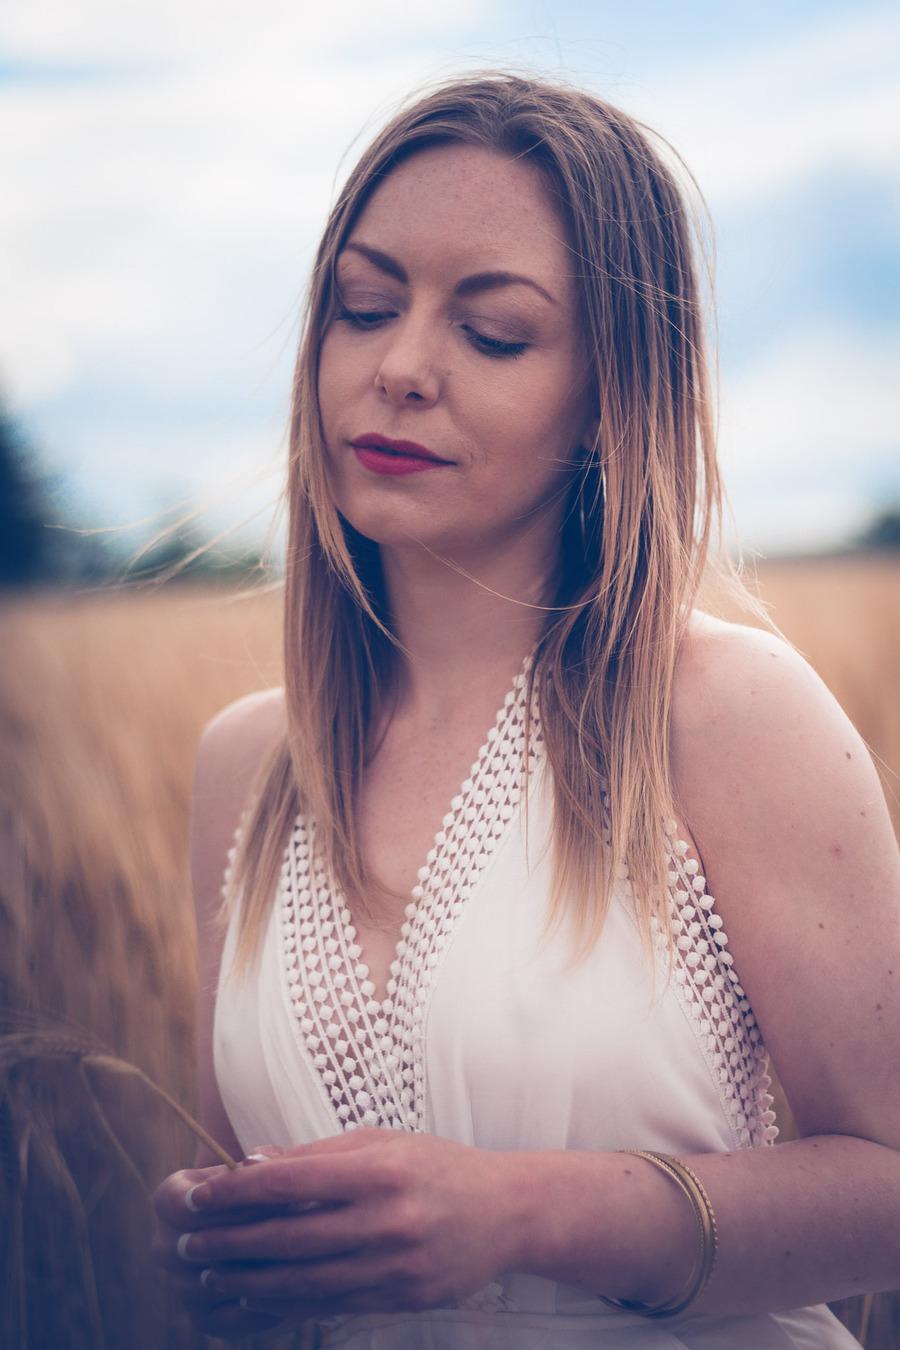 Somewhere, someday / Photography by Fidra, Model Aurora Violet / Uploaded 30th July 2016 @ 02:59 PM